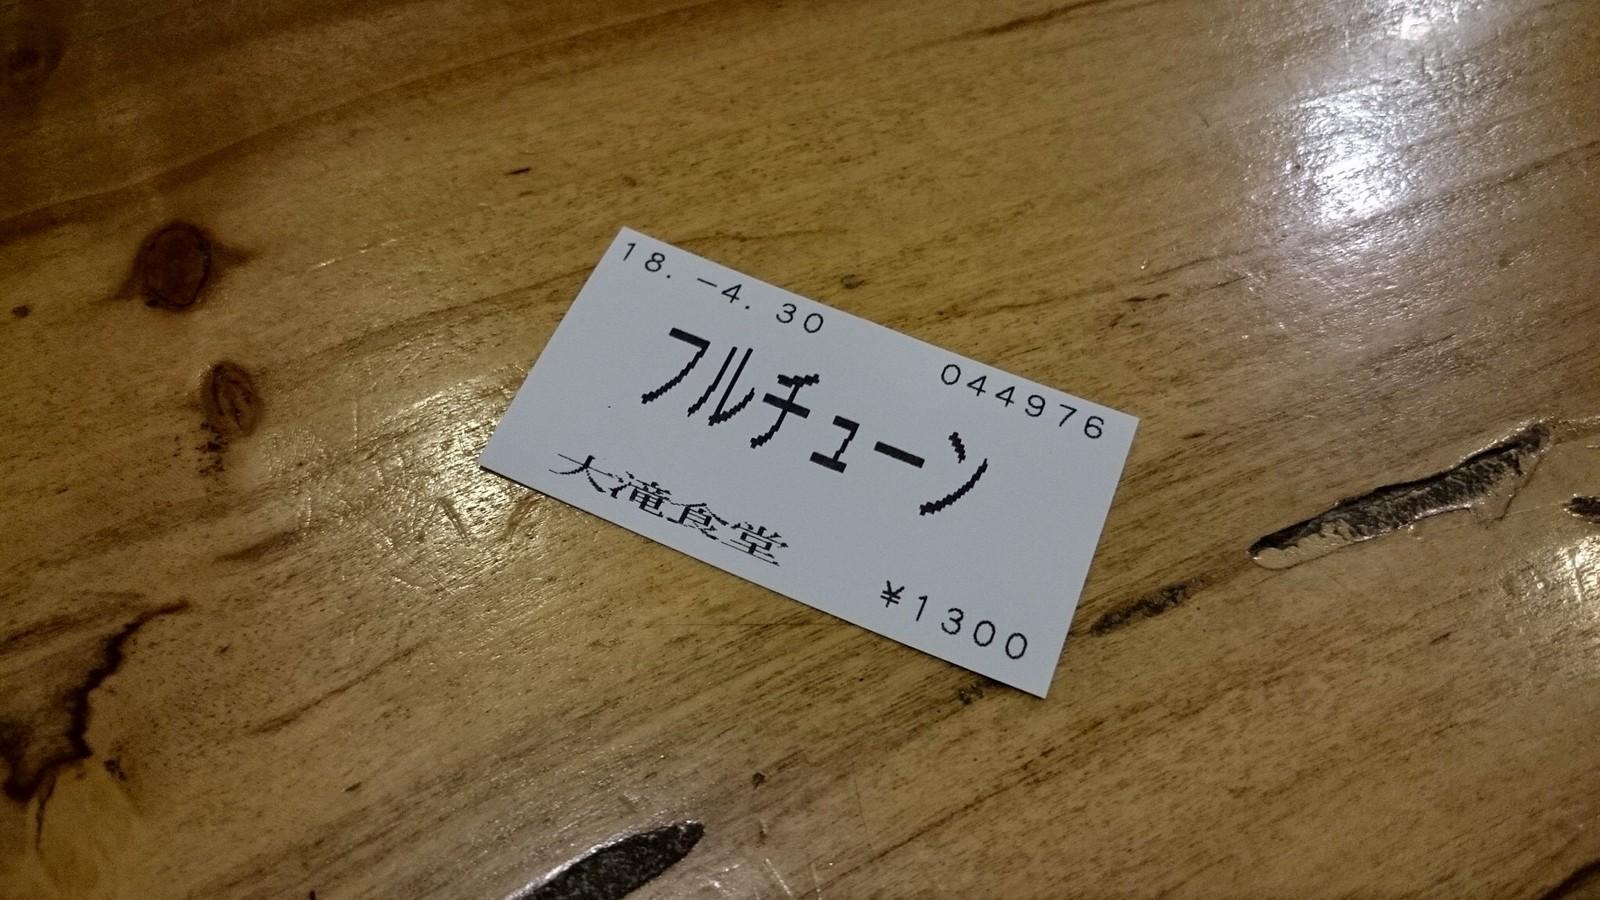 219128F7-2FFA-431C-BA58-FEDD1FAA9CDE